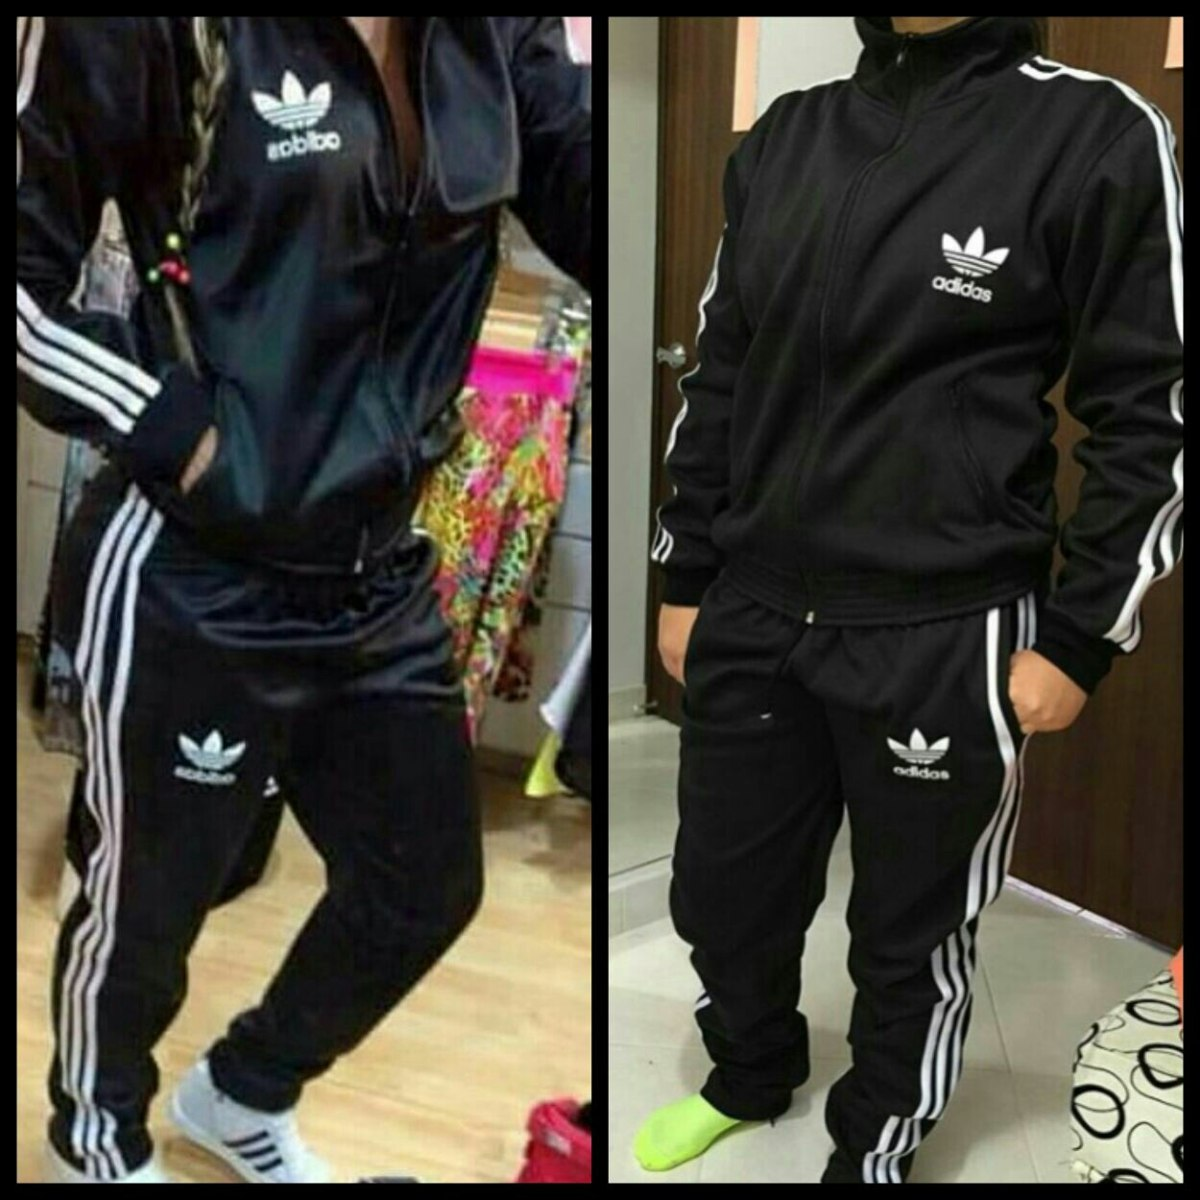 ropa ropa mujer ropa adidas deportiva adidas deportiva conjunto deportiva mujer adidas conjunto mujer qpjVGLSMzU